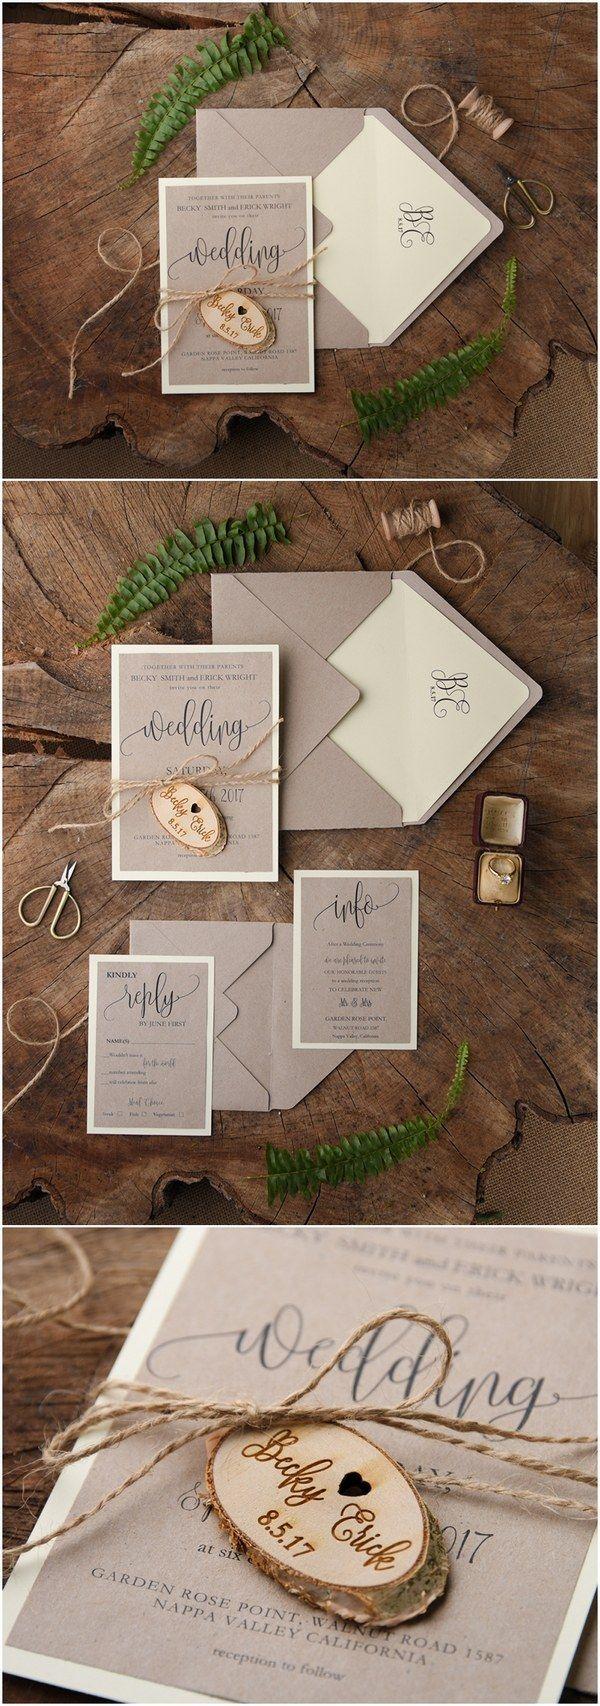 country wedding invitations rustic country wedding invitations Rustic country wedding invitations rusticweddingideas